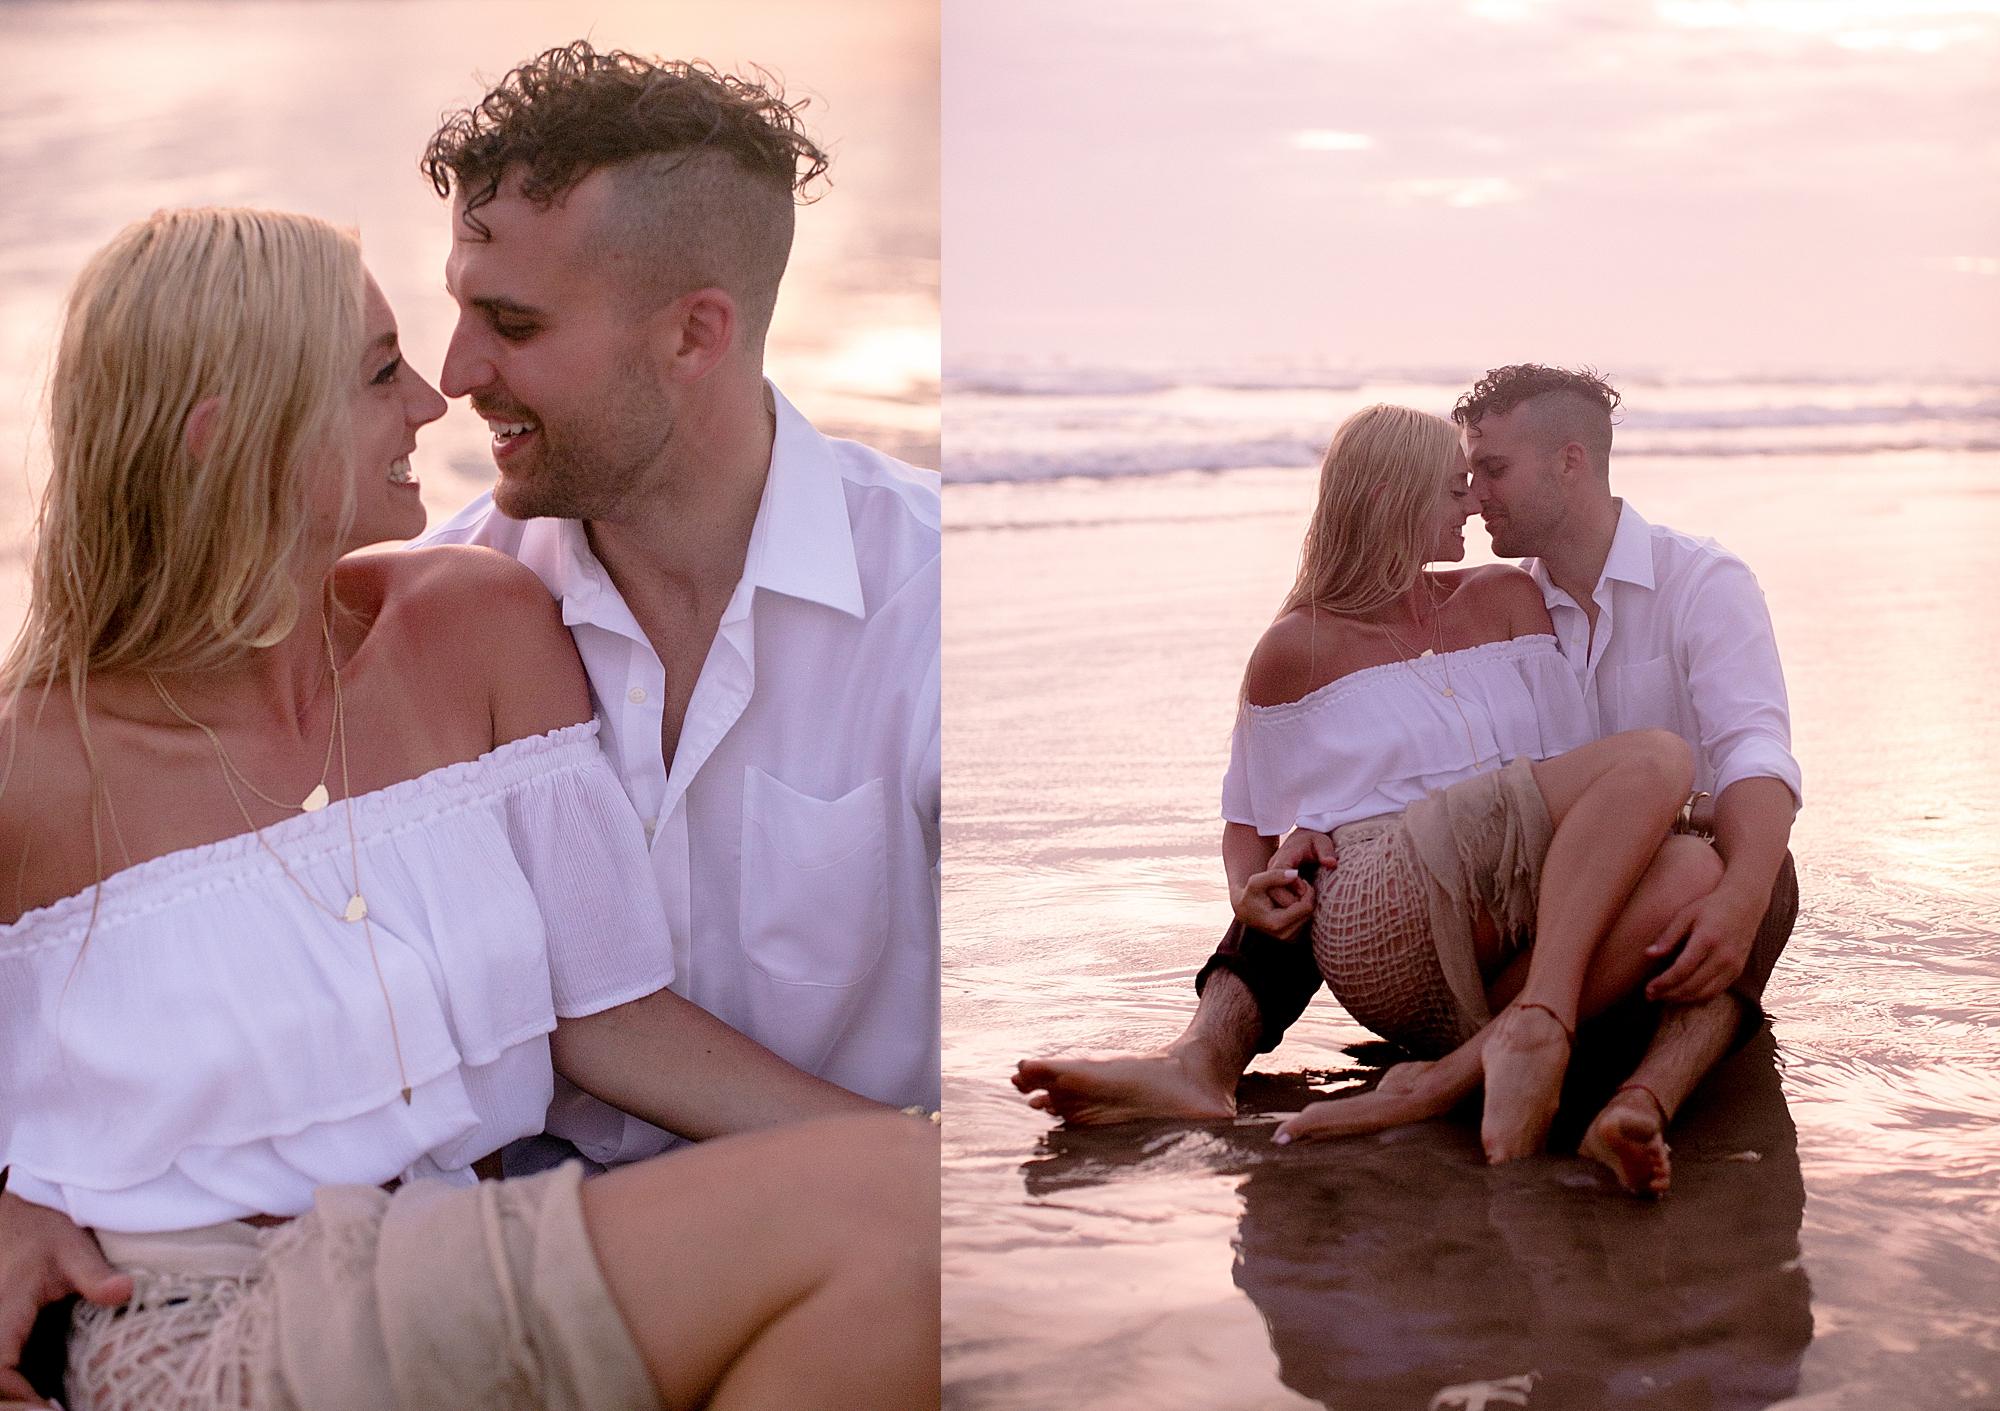 Epic and Adventurous Travel Wedding and Portrait Photographer in Nosara, Costa Rica - Kelee Bovelle @xokelee @keleeb - 21.jpg